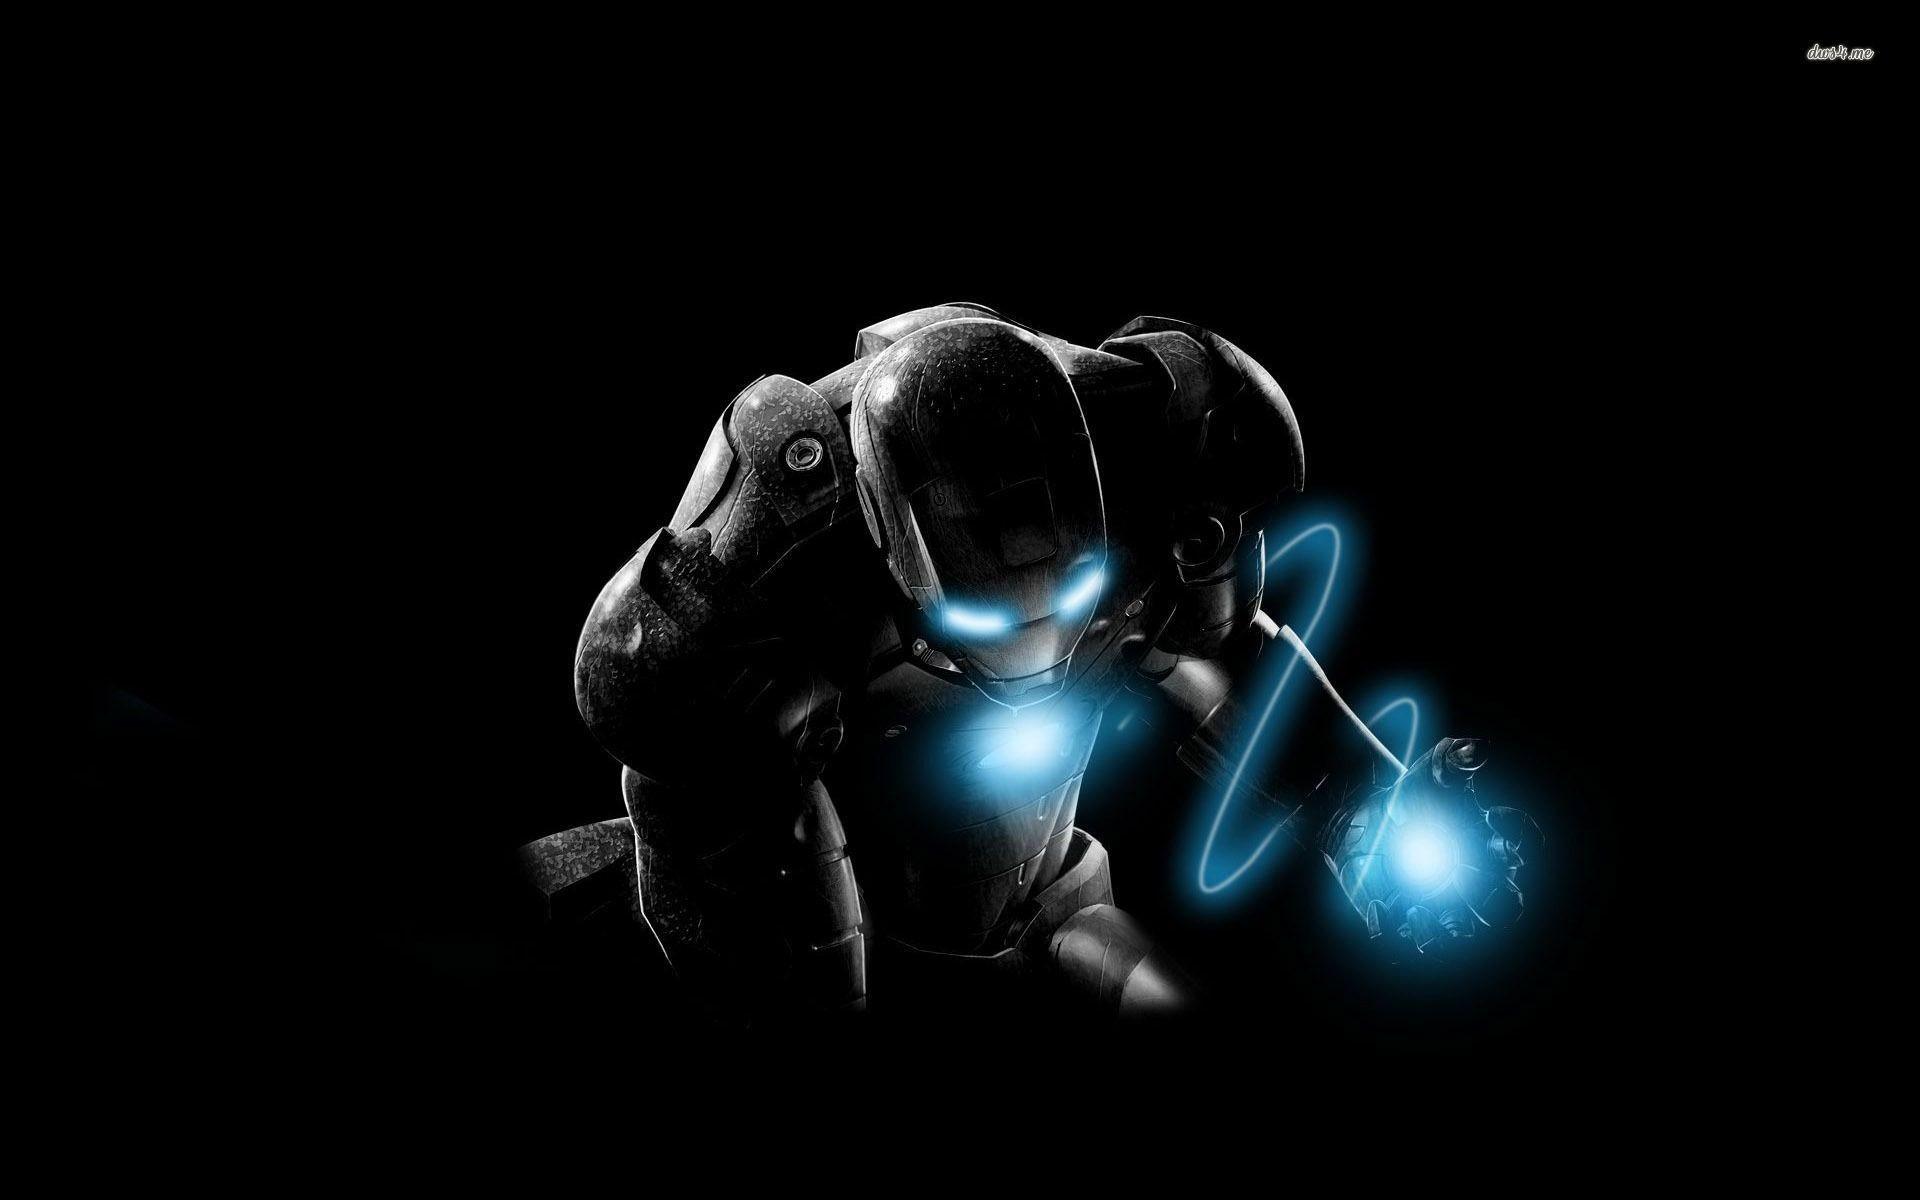 best ideas about Iron man wallpaper on Pinterest Iron man